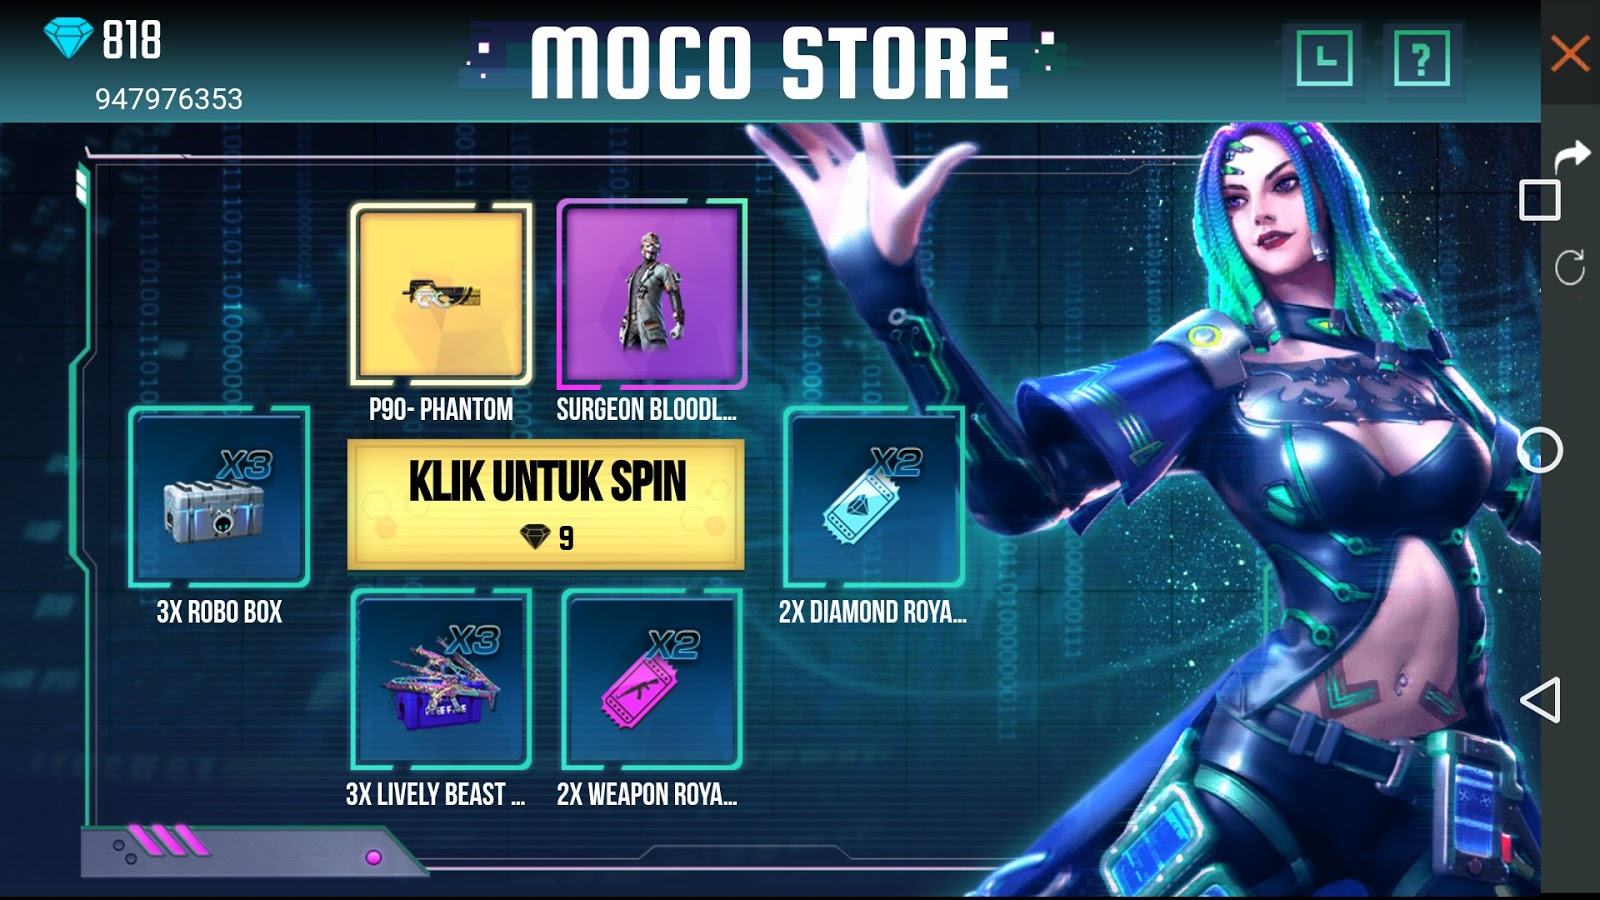 event moco store 9 diamonds